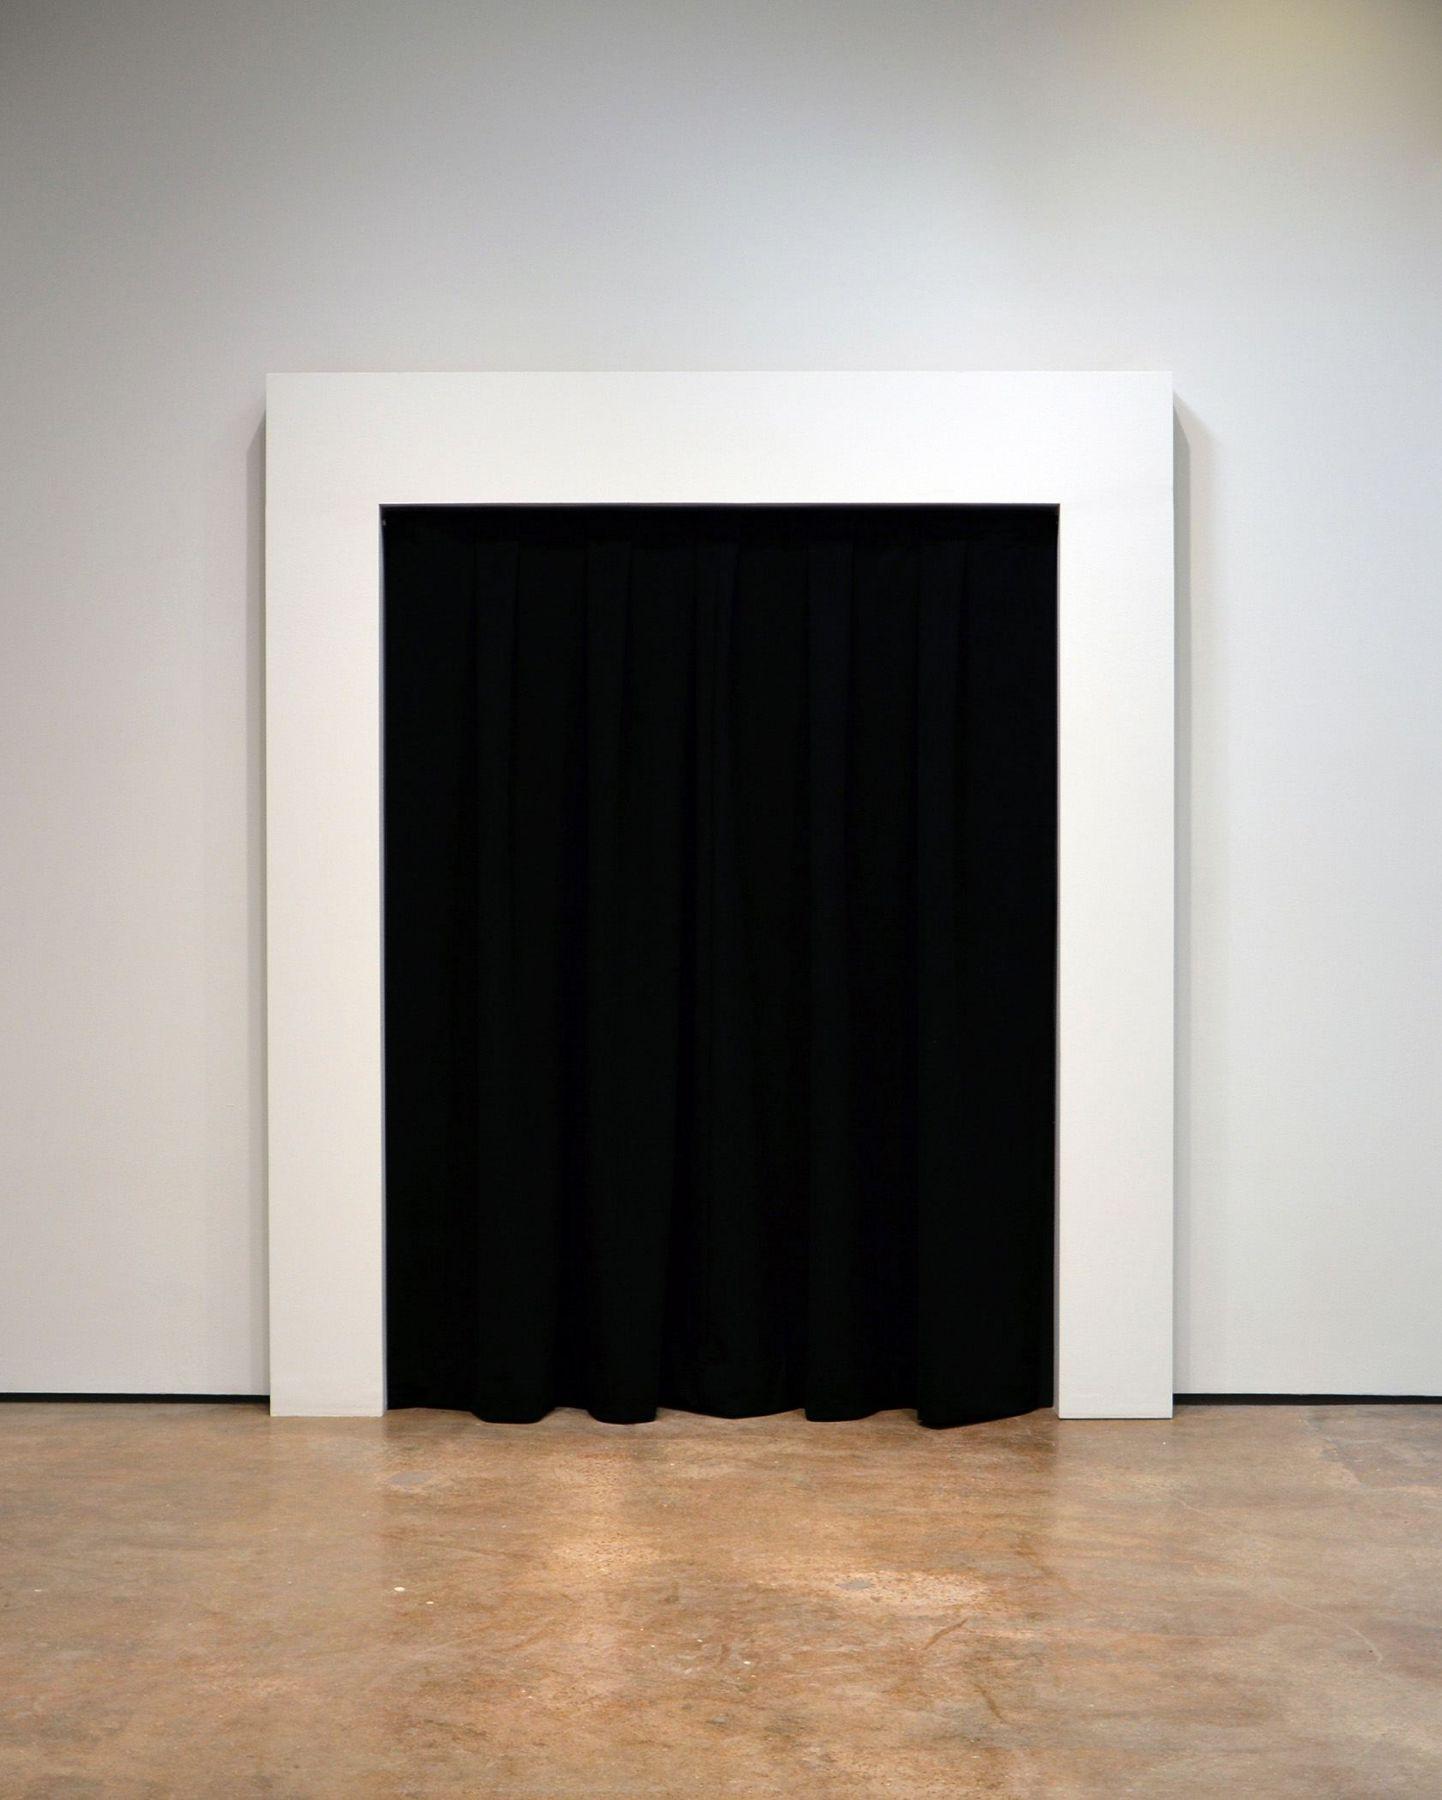 black curtain by john waters